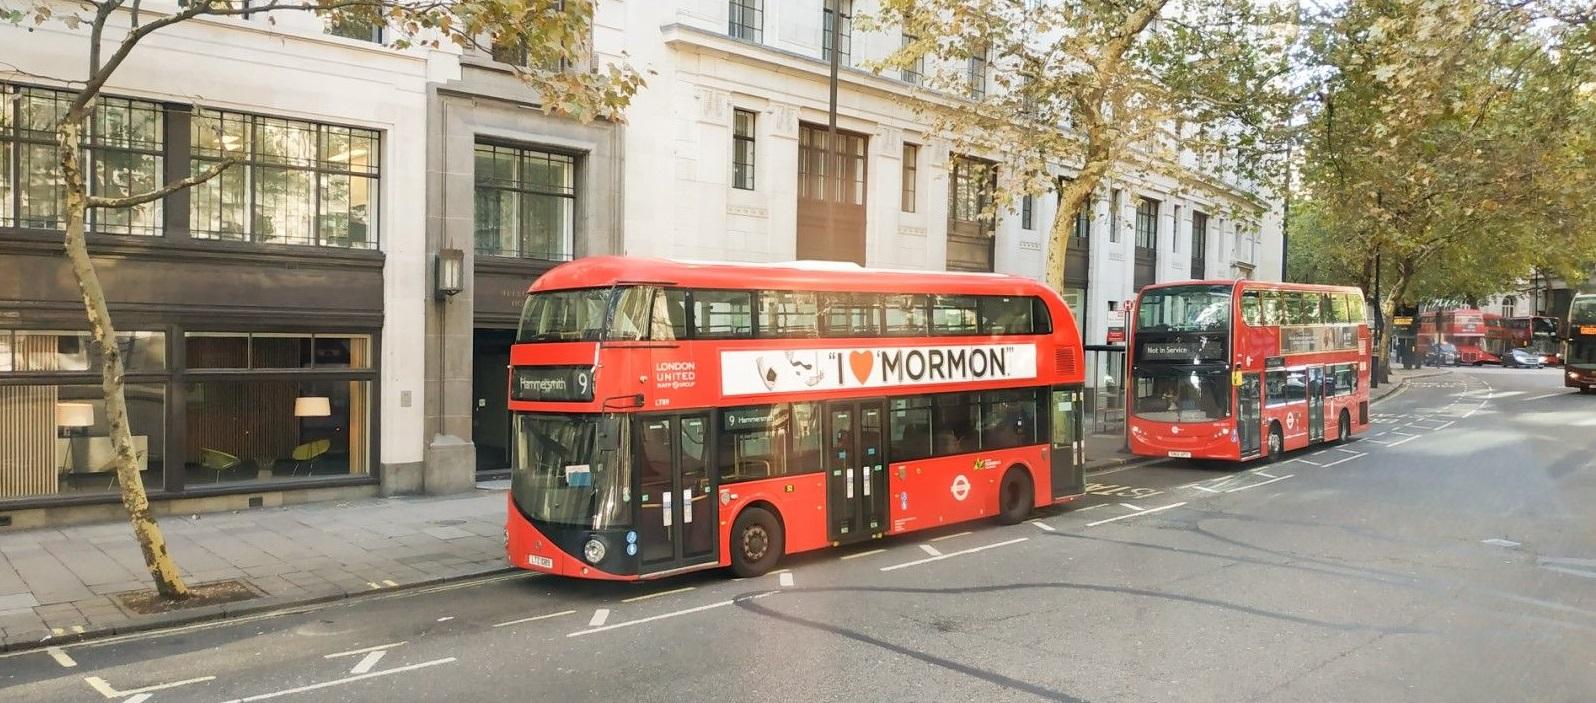 London, Pariz - putopis Autobus na kat